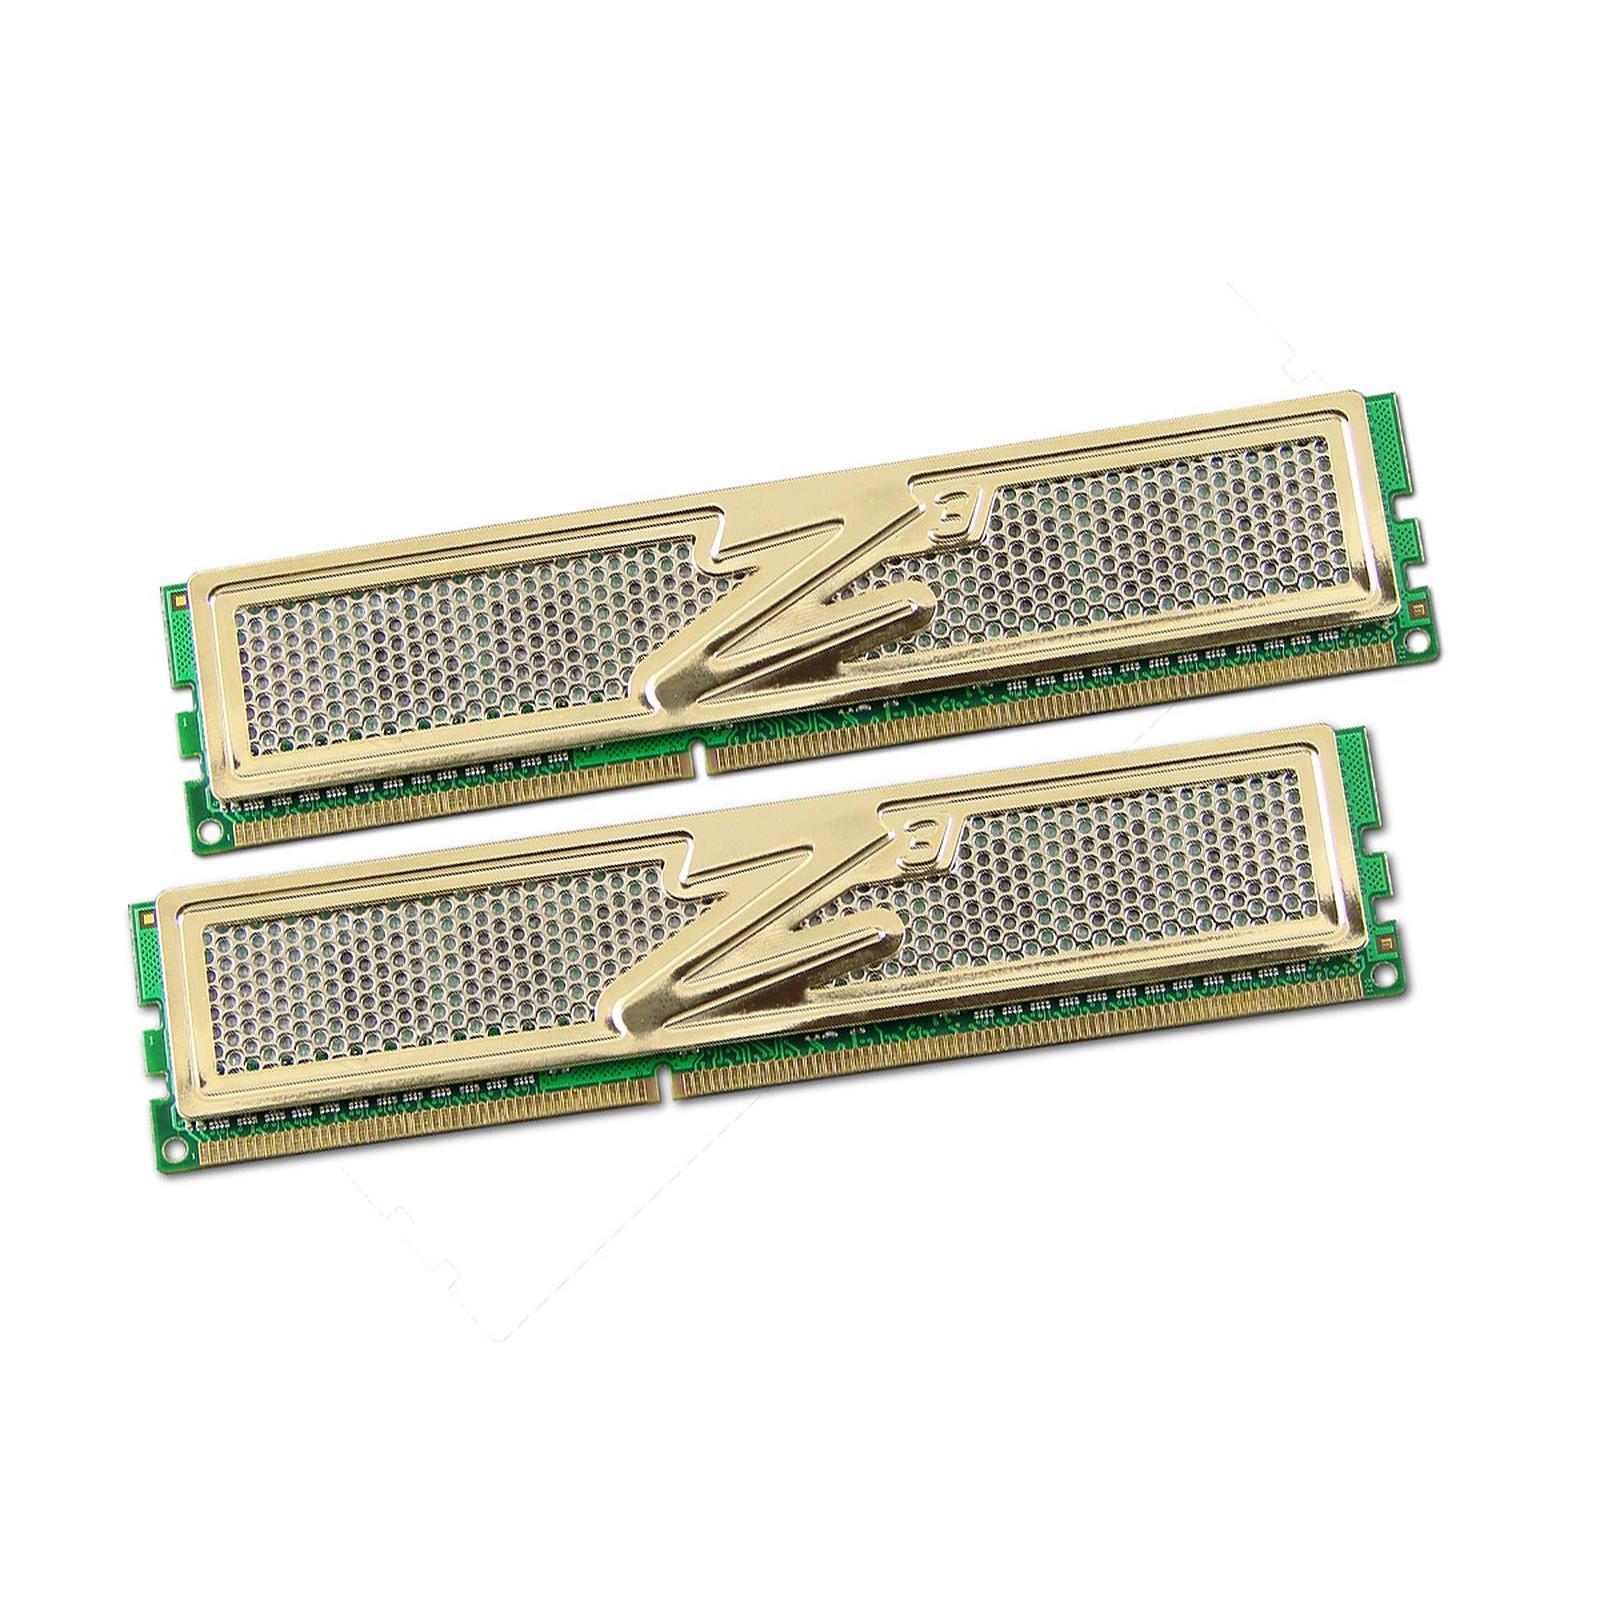 OCZ Gold Edition 4 Go (2x 2Go) DDR3 2133 MHz